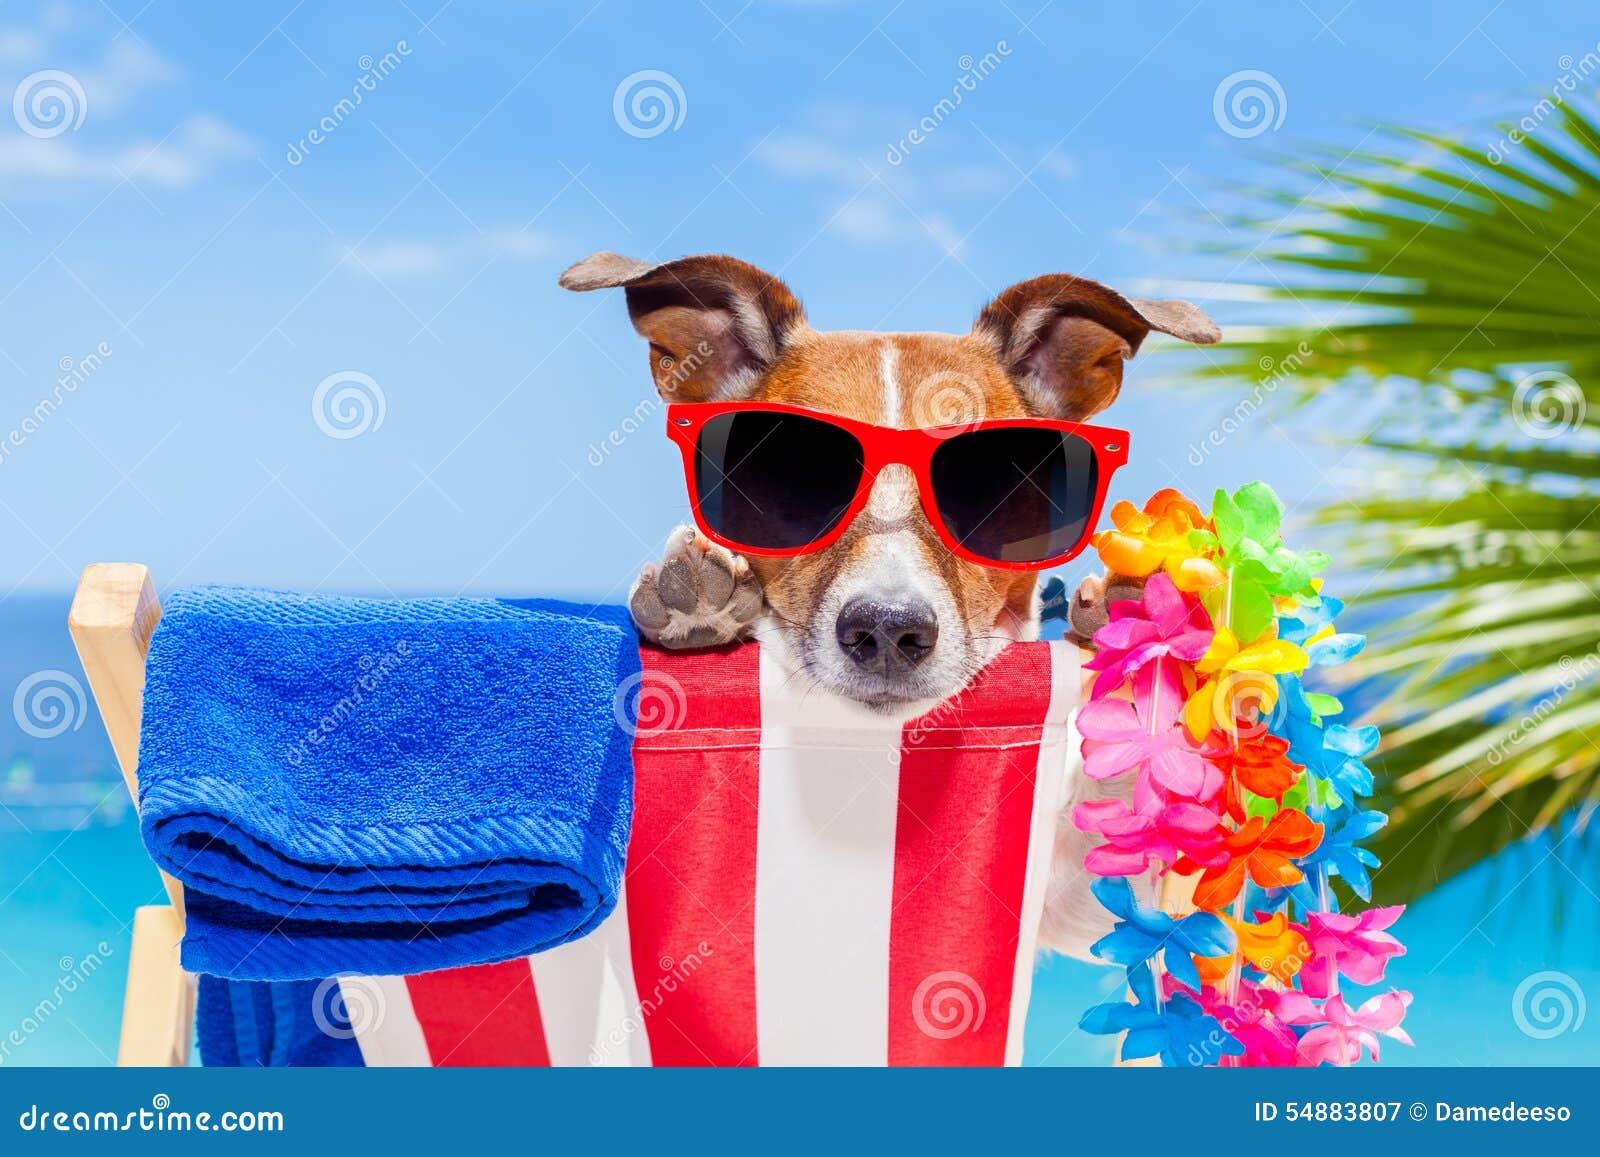 Dog Summer Holiday Vacation Stock Photo Image 54883807